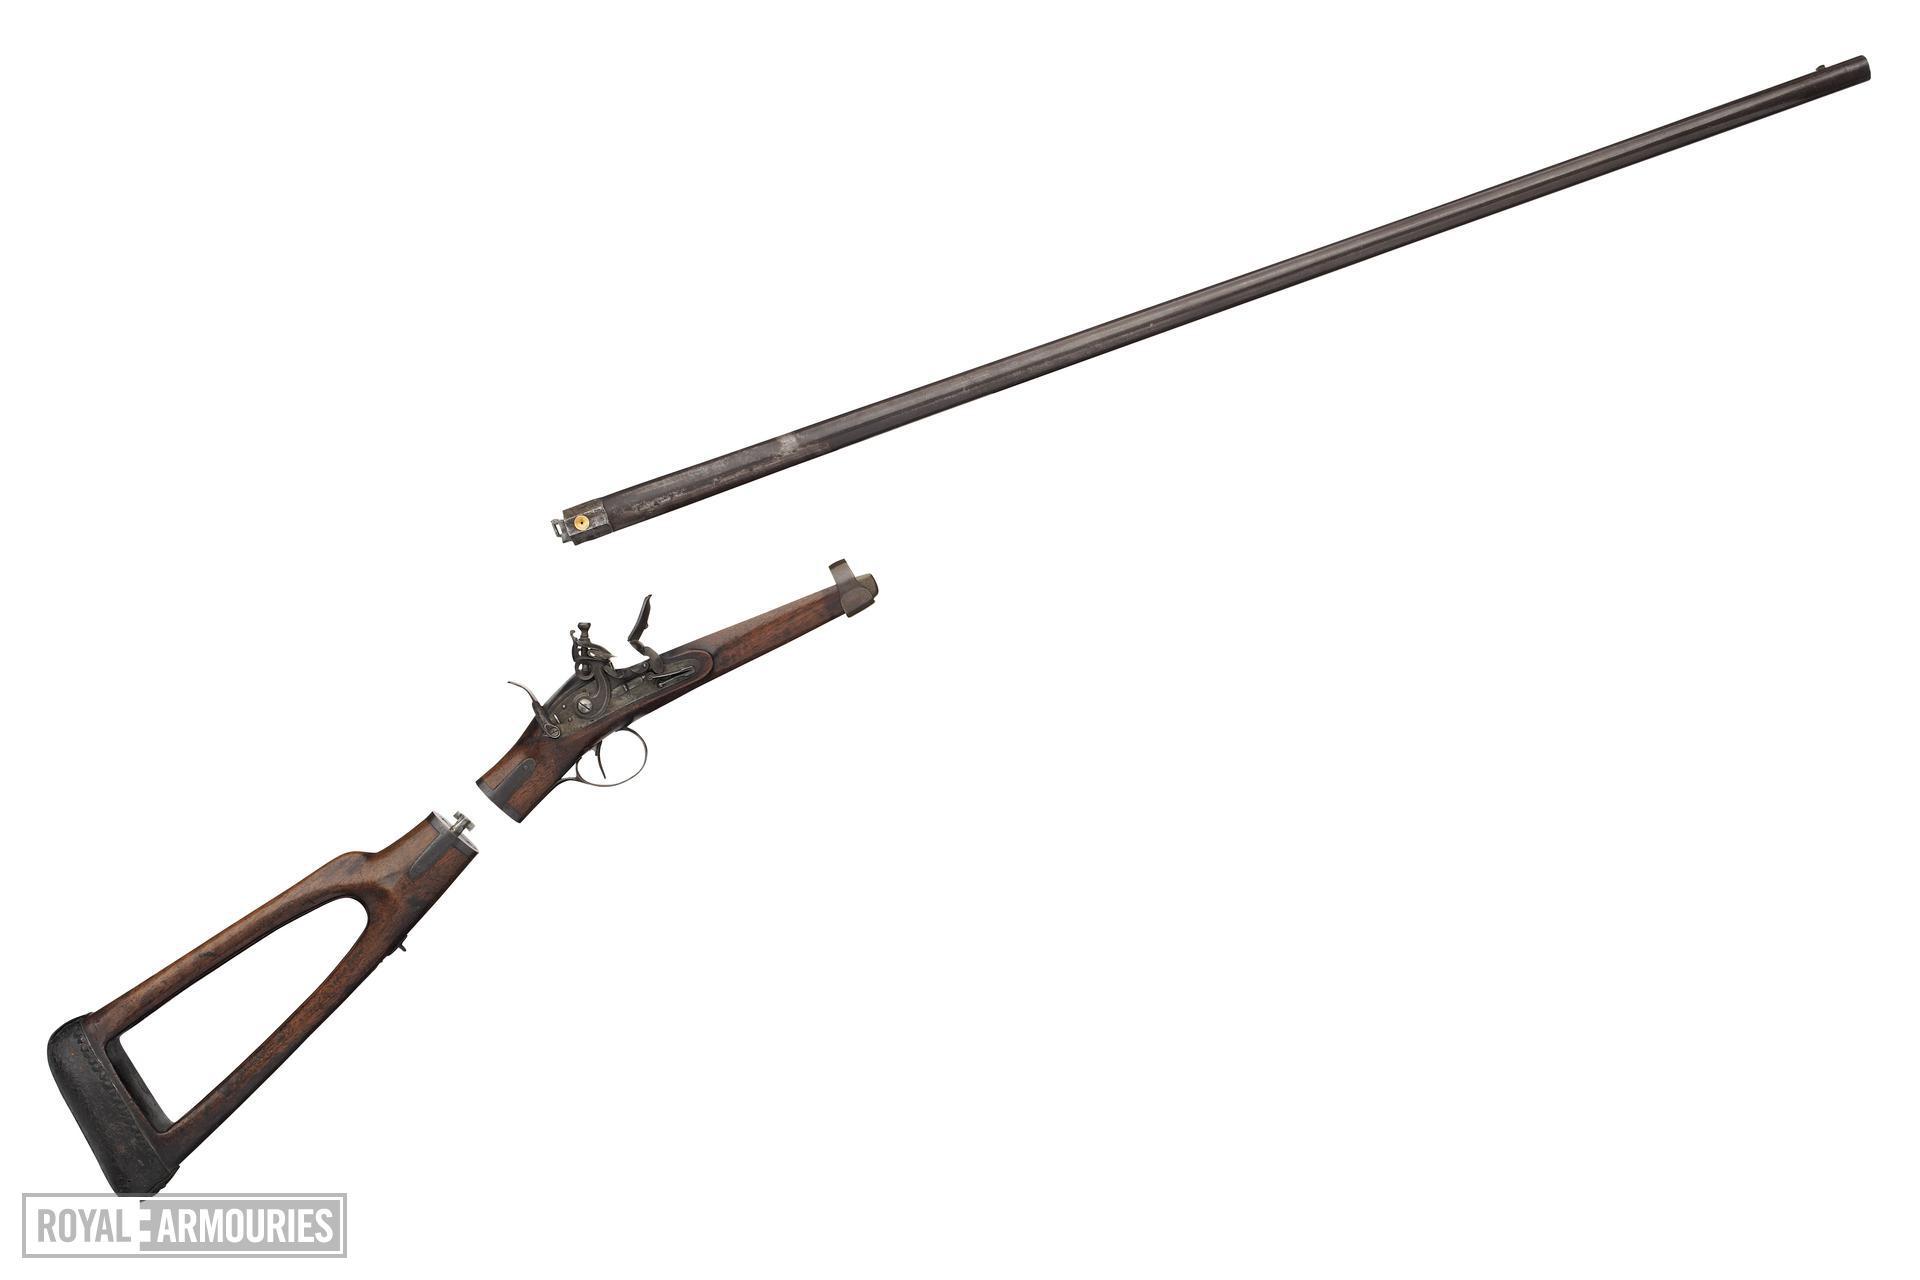 Flintlock gun - By John Barton